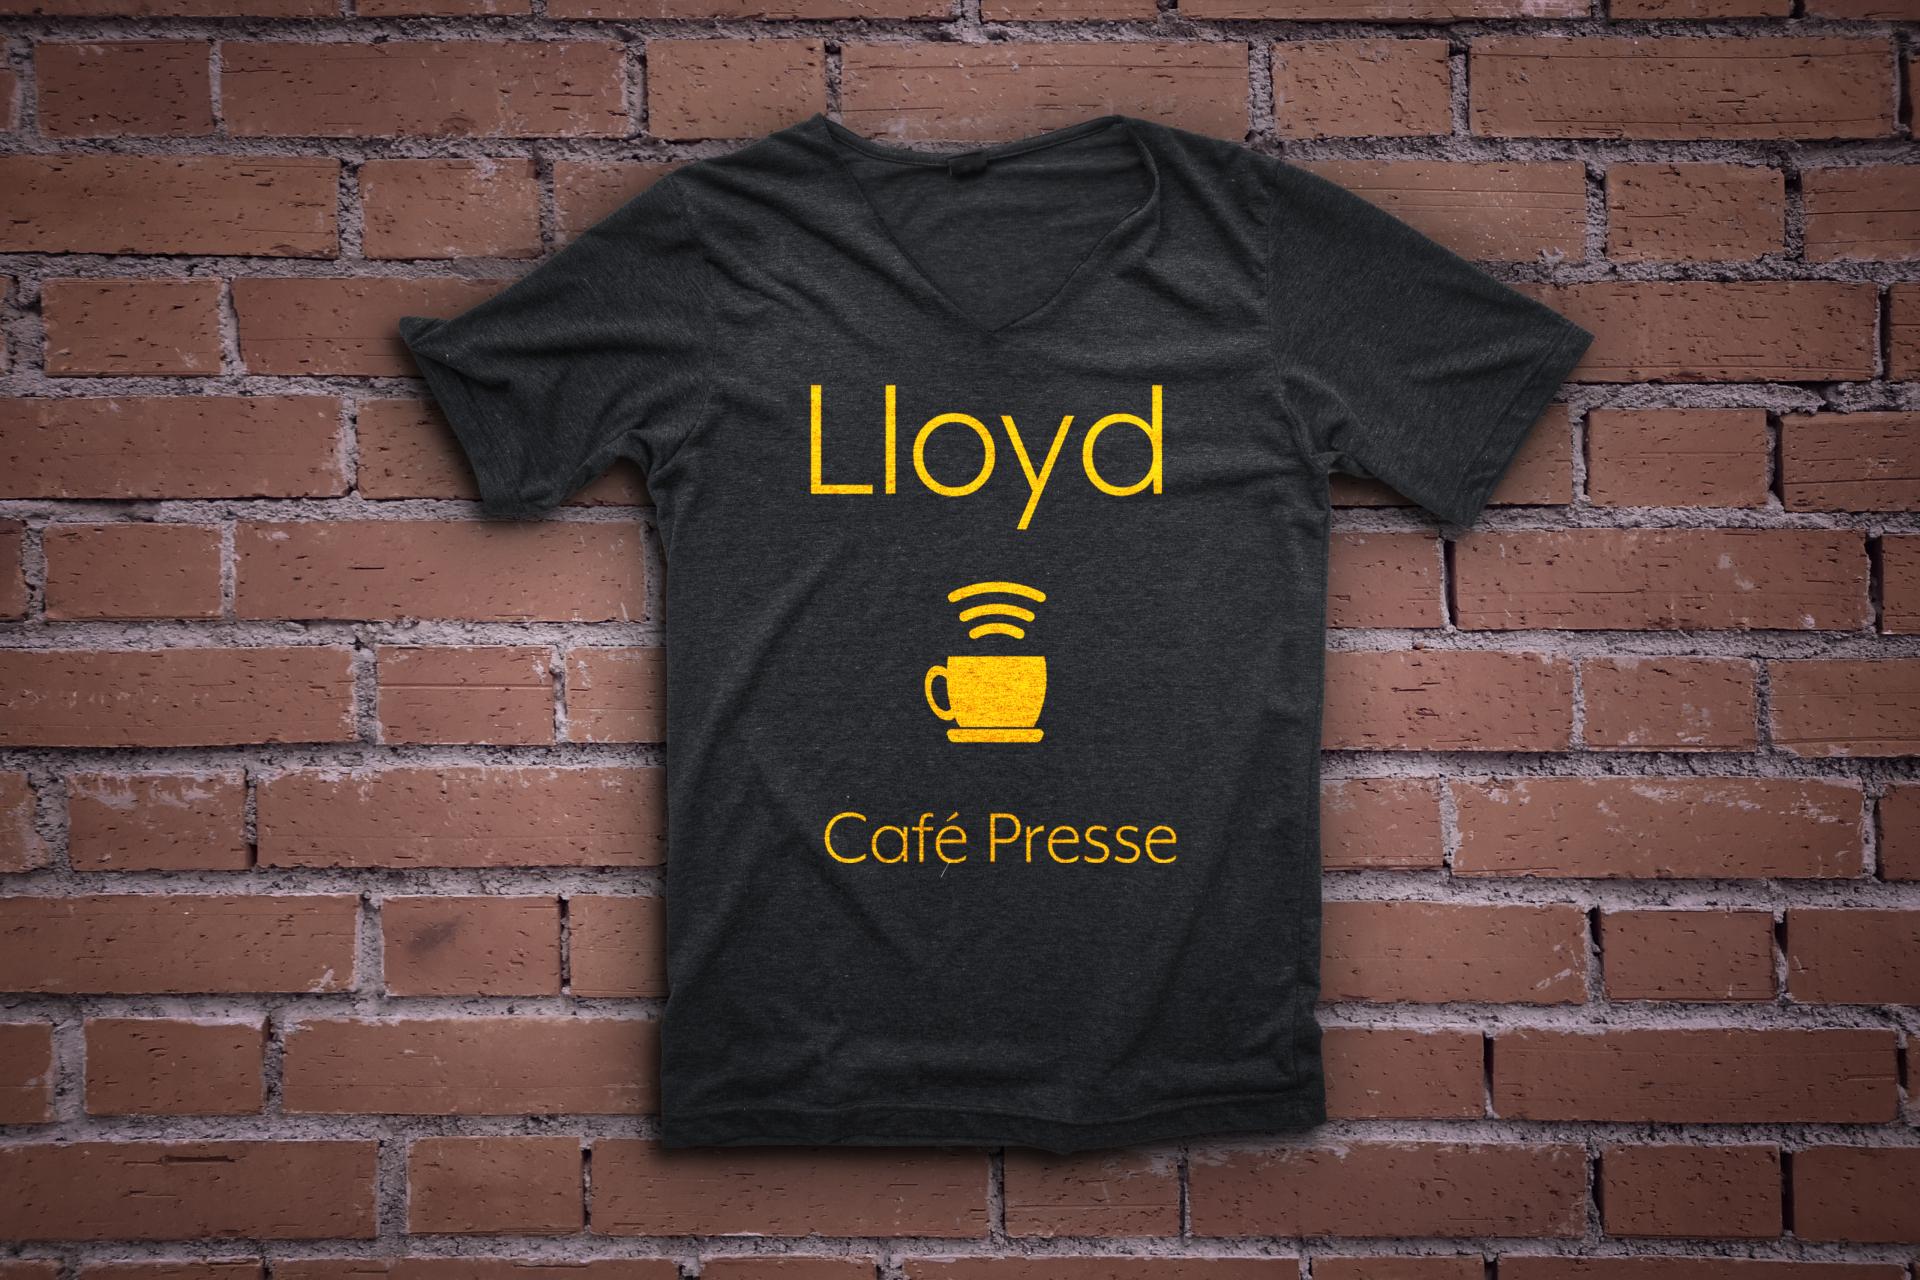 Lloyd_black-t-shirt2